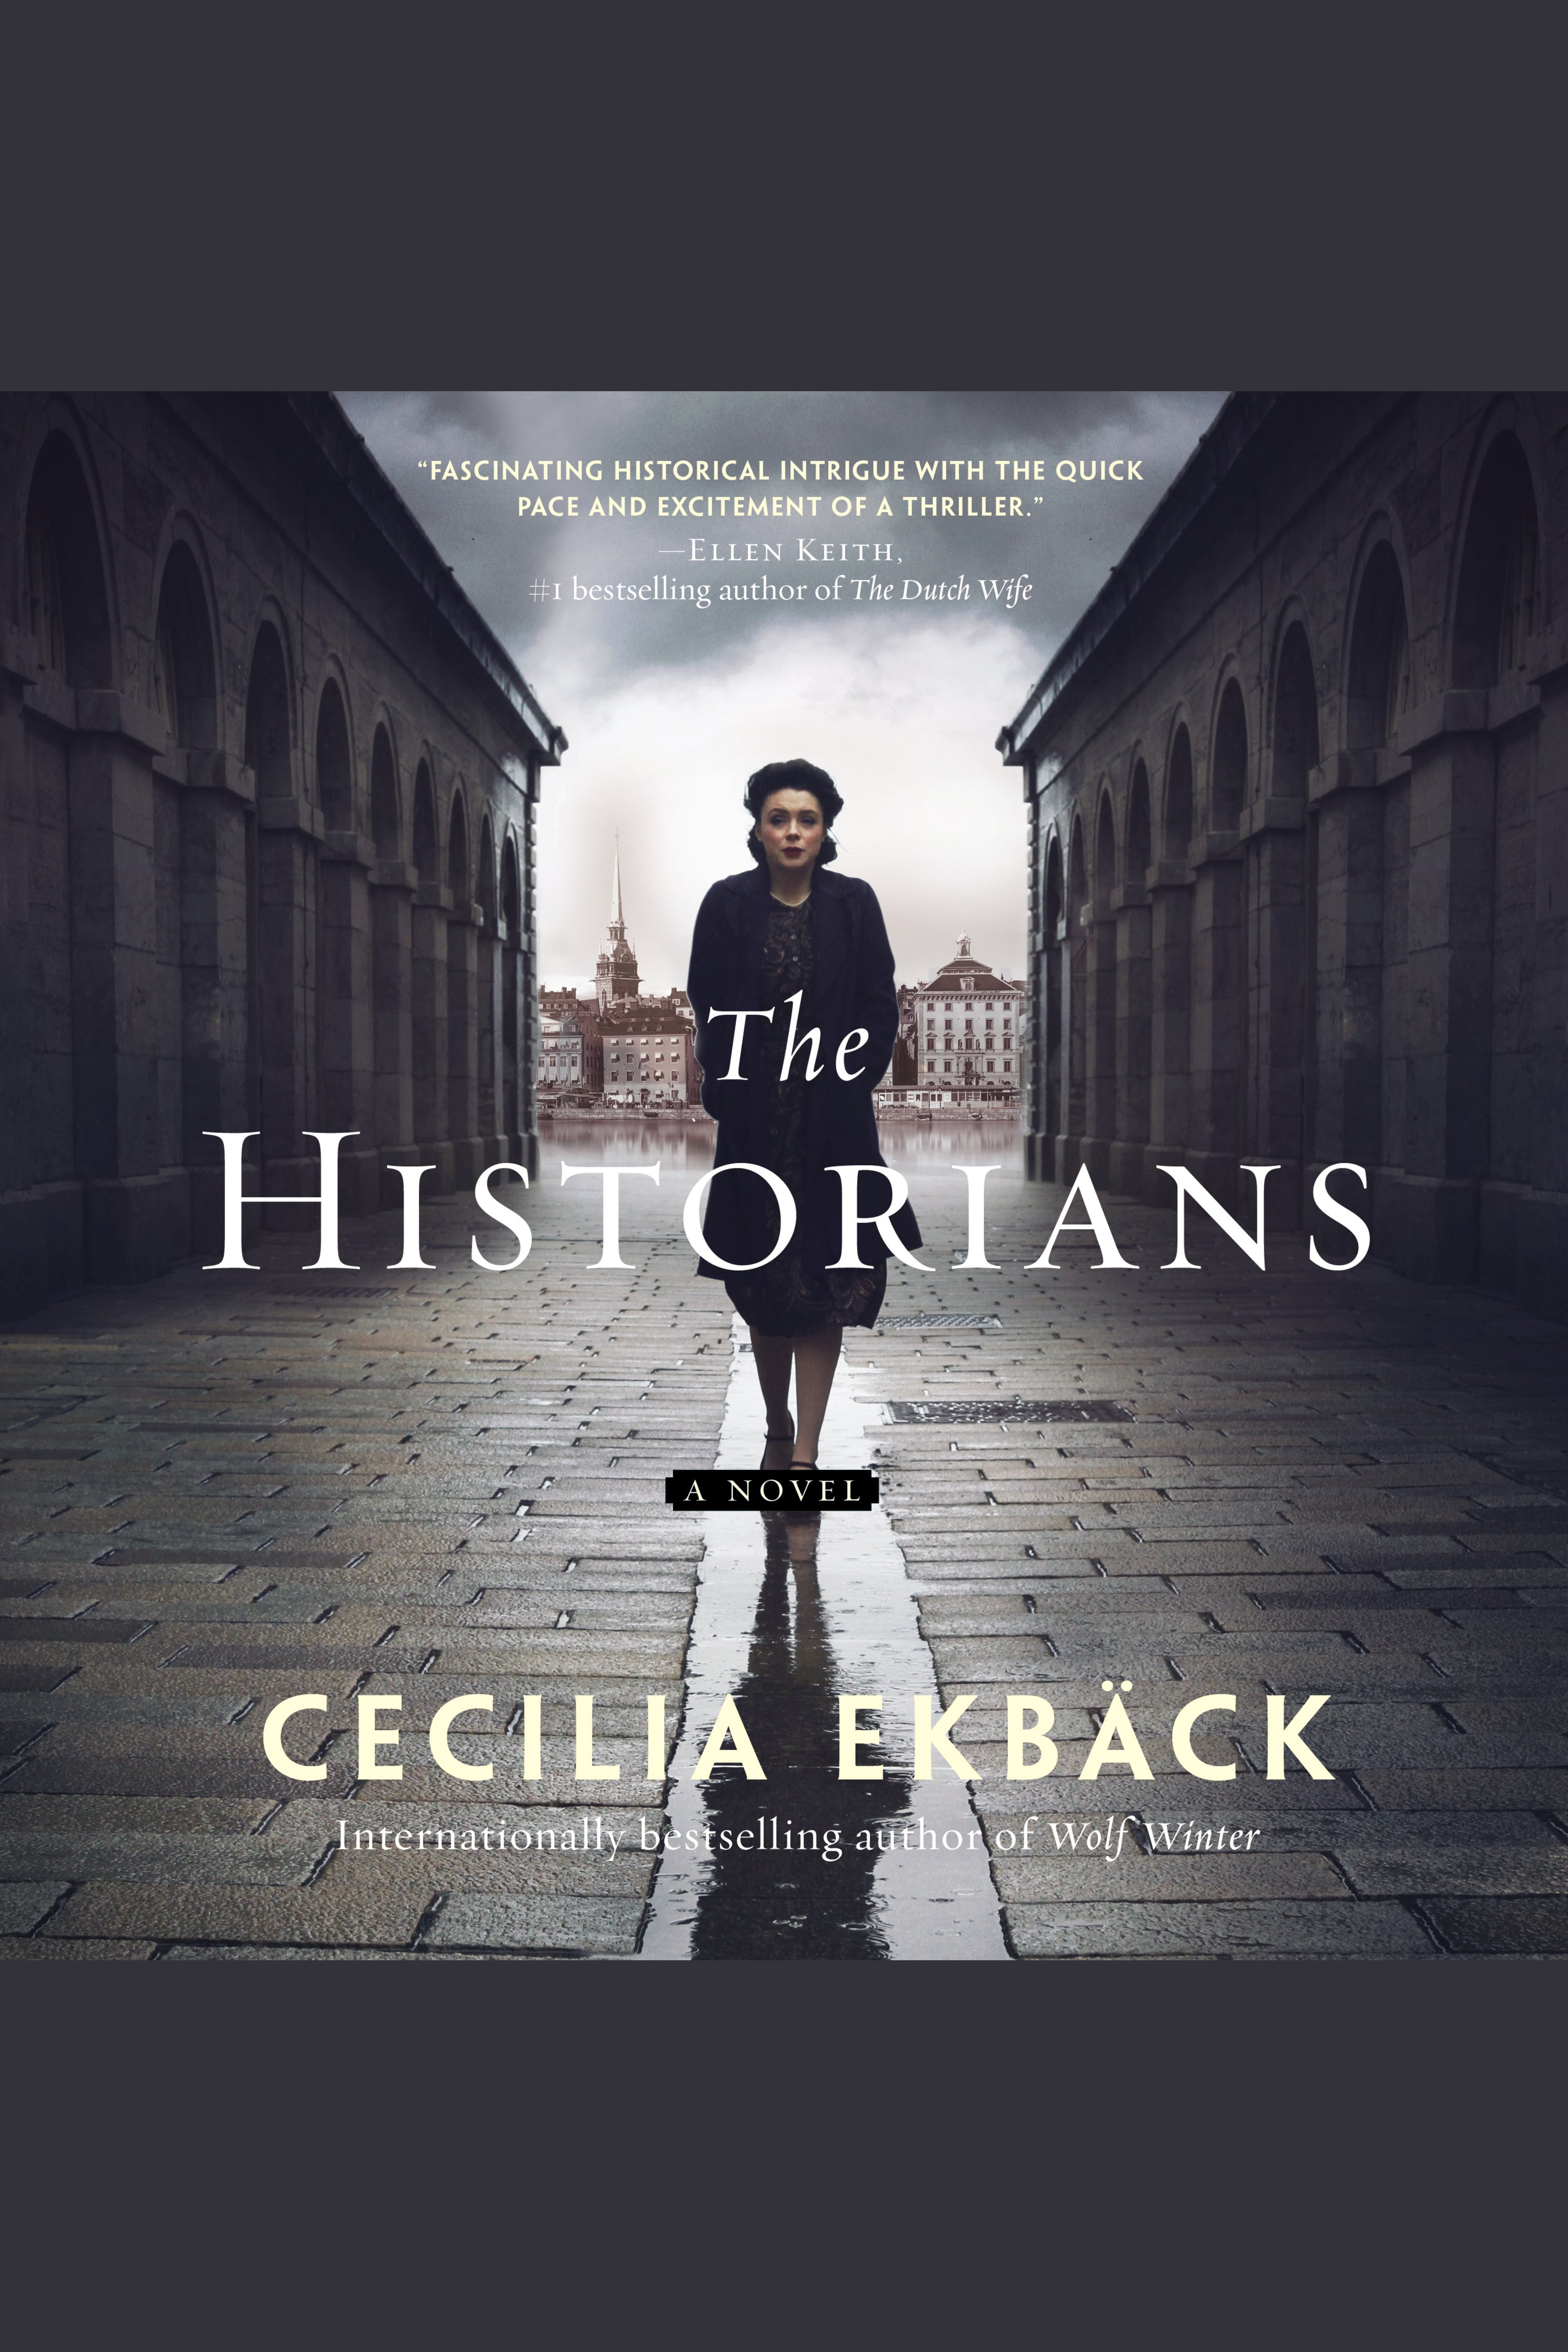 Historians, The